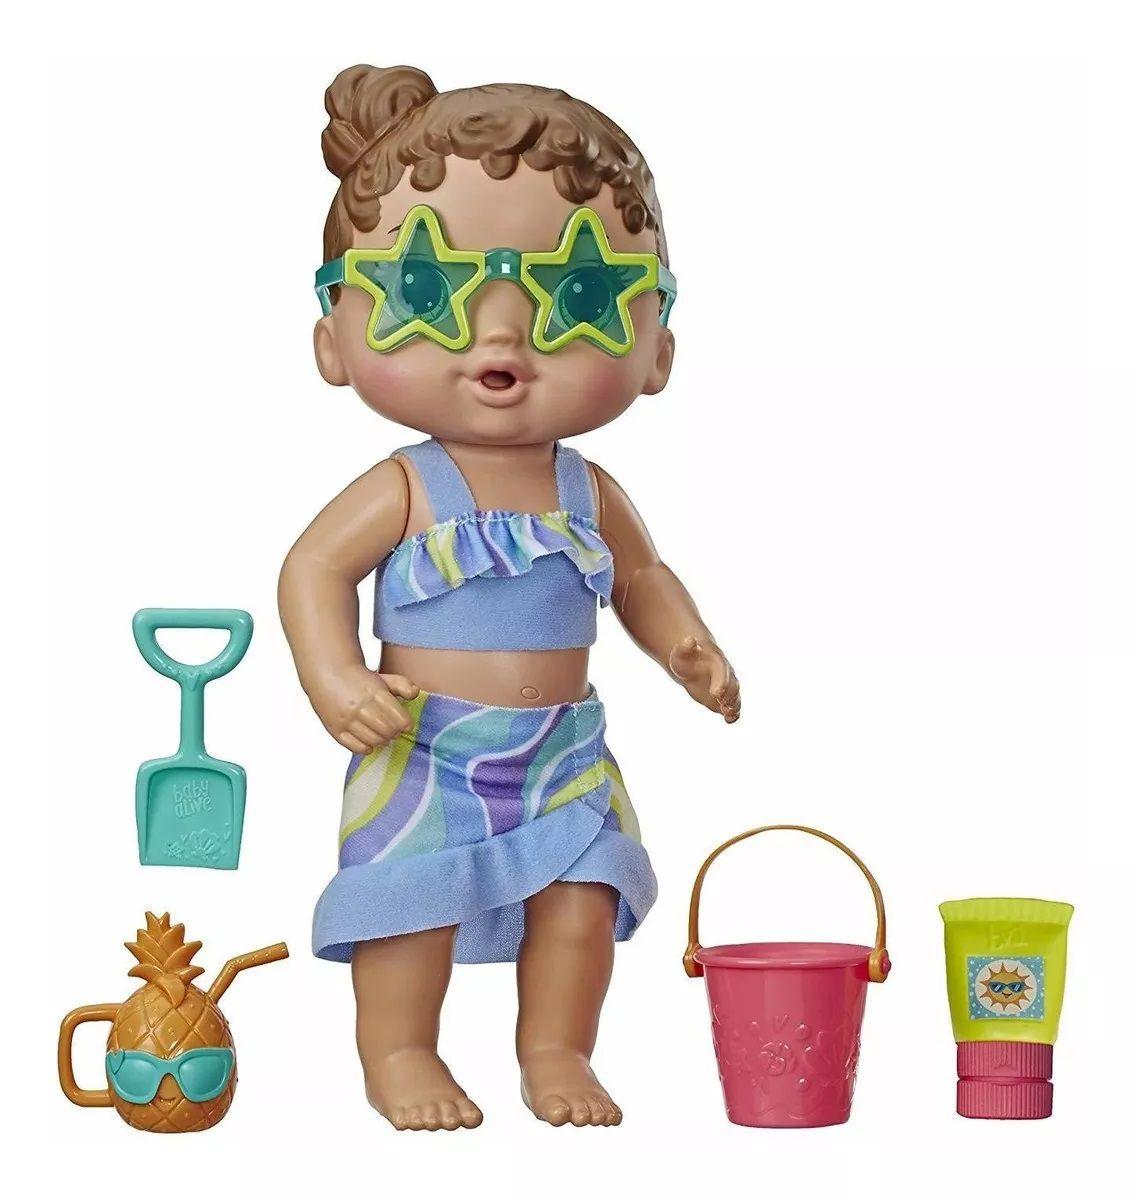 Boneca Baby Alive: Sol e Areia - Hasbro